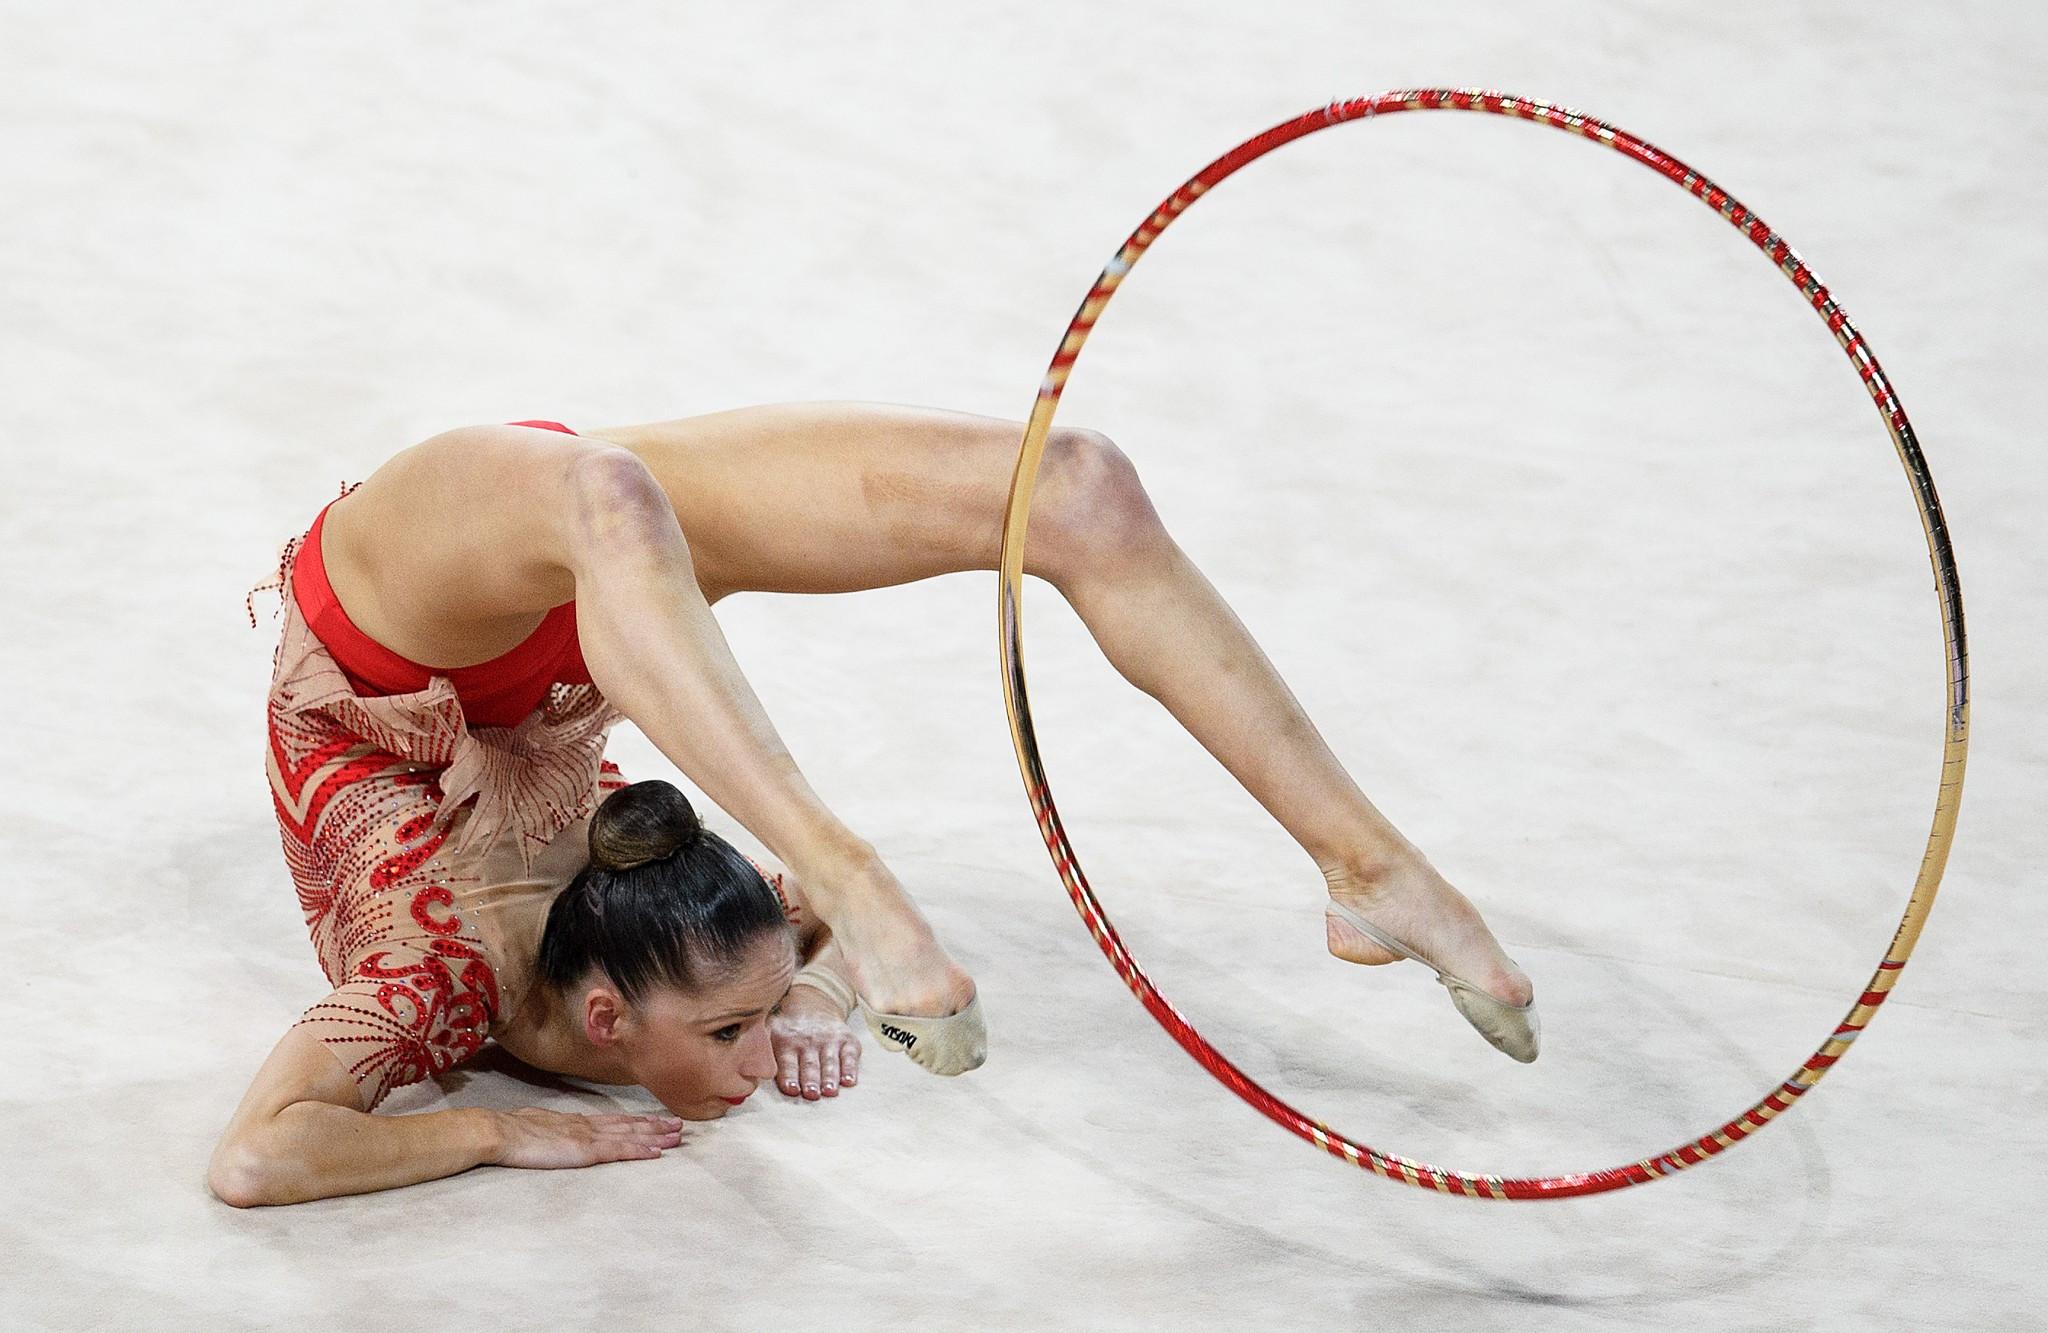 Rio 2016 Olympians among field for Rhythmic Gymnastics World Championships